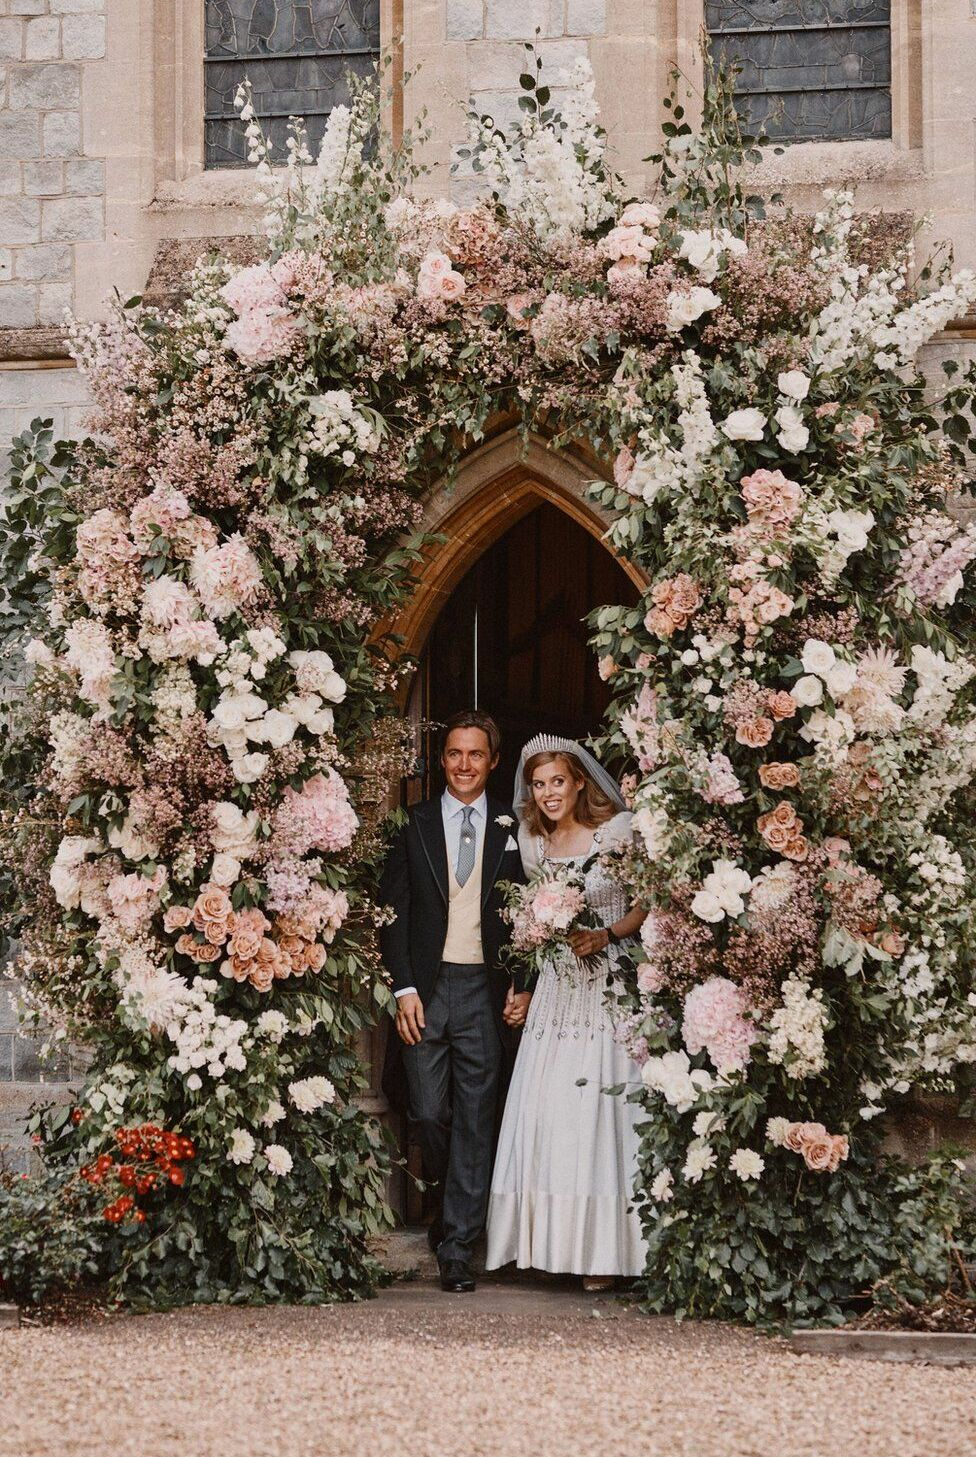 Mariage de la prince Beatrice d'York avec Edoardo Mapelli Mozzi, le 17 juillet 2020.